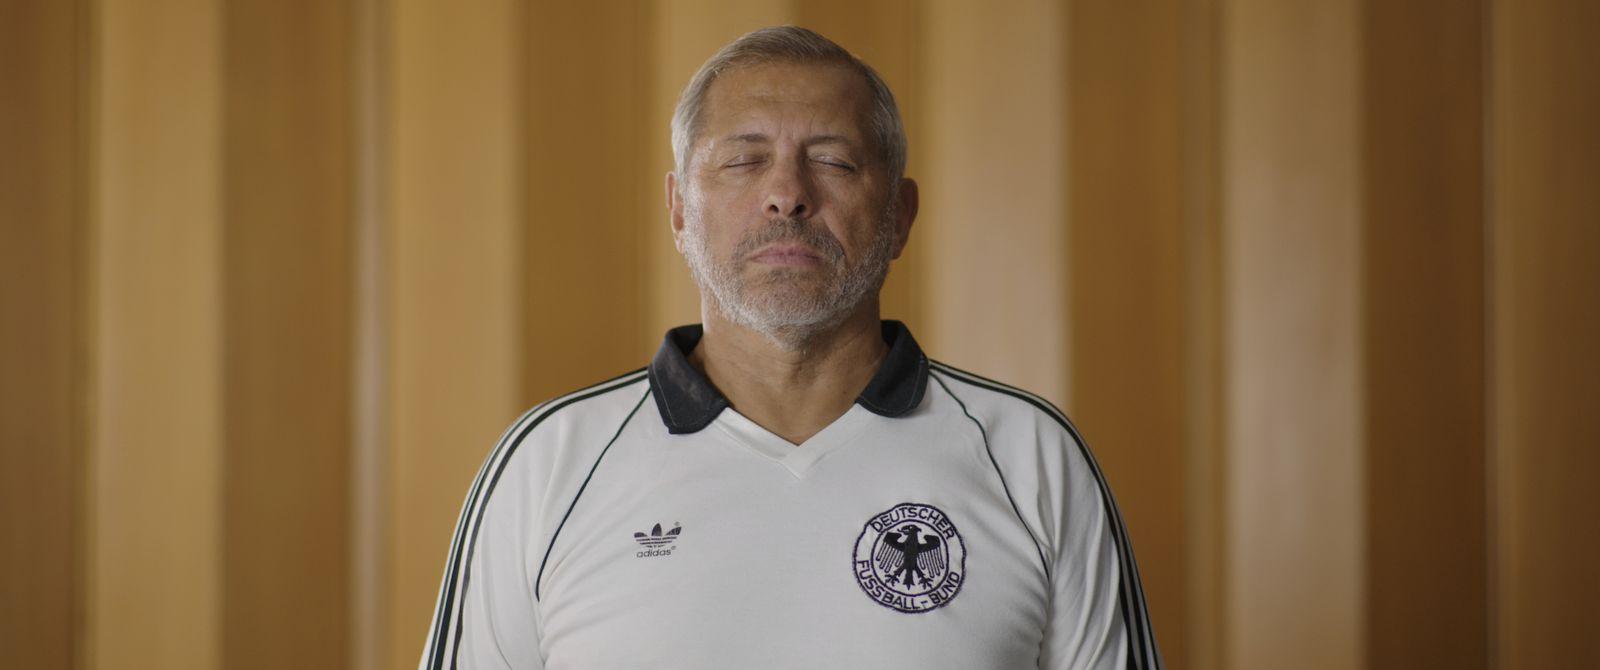 Film/ Schwarze Adler